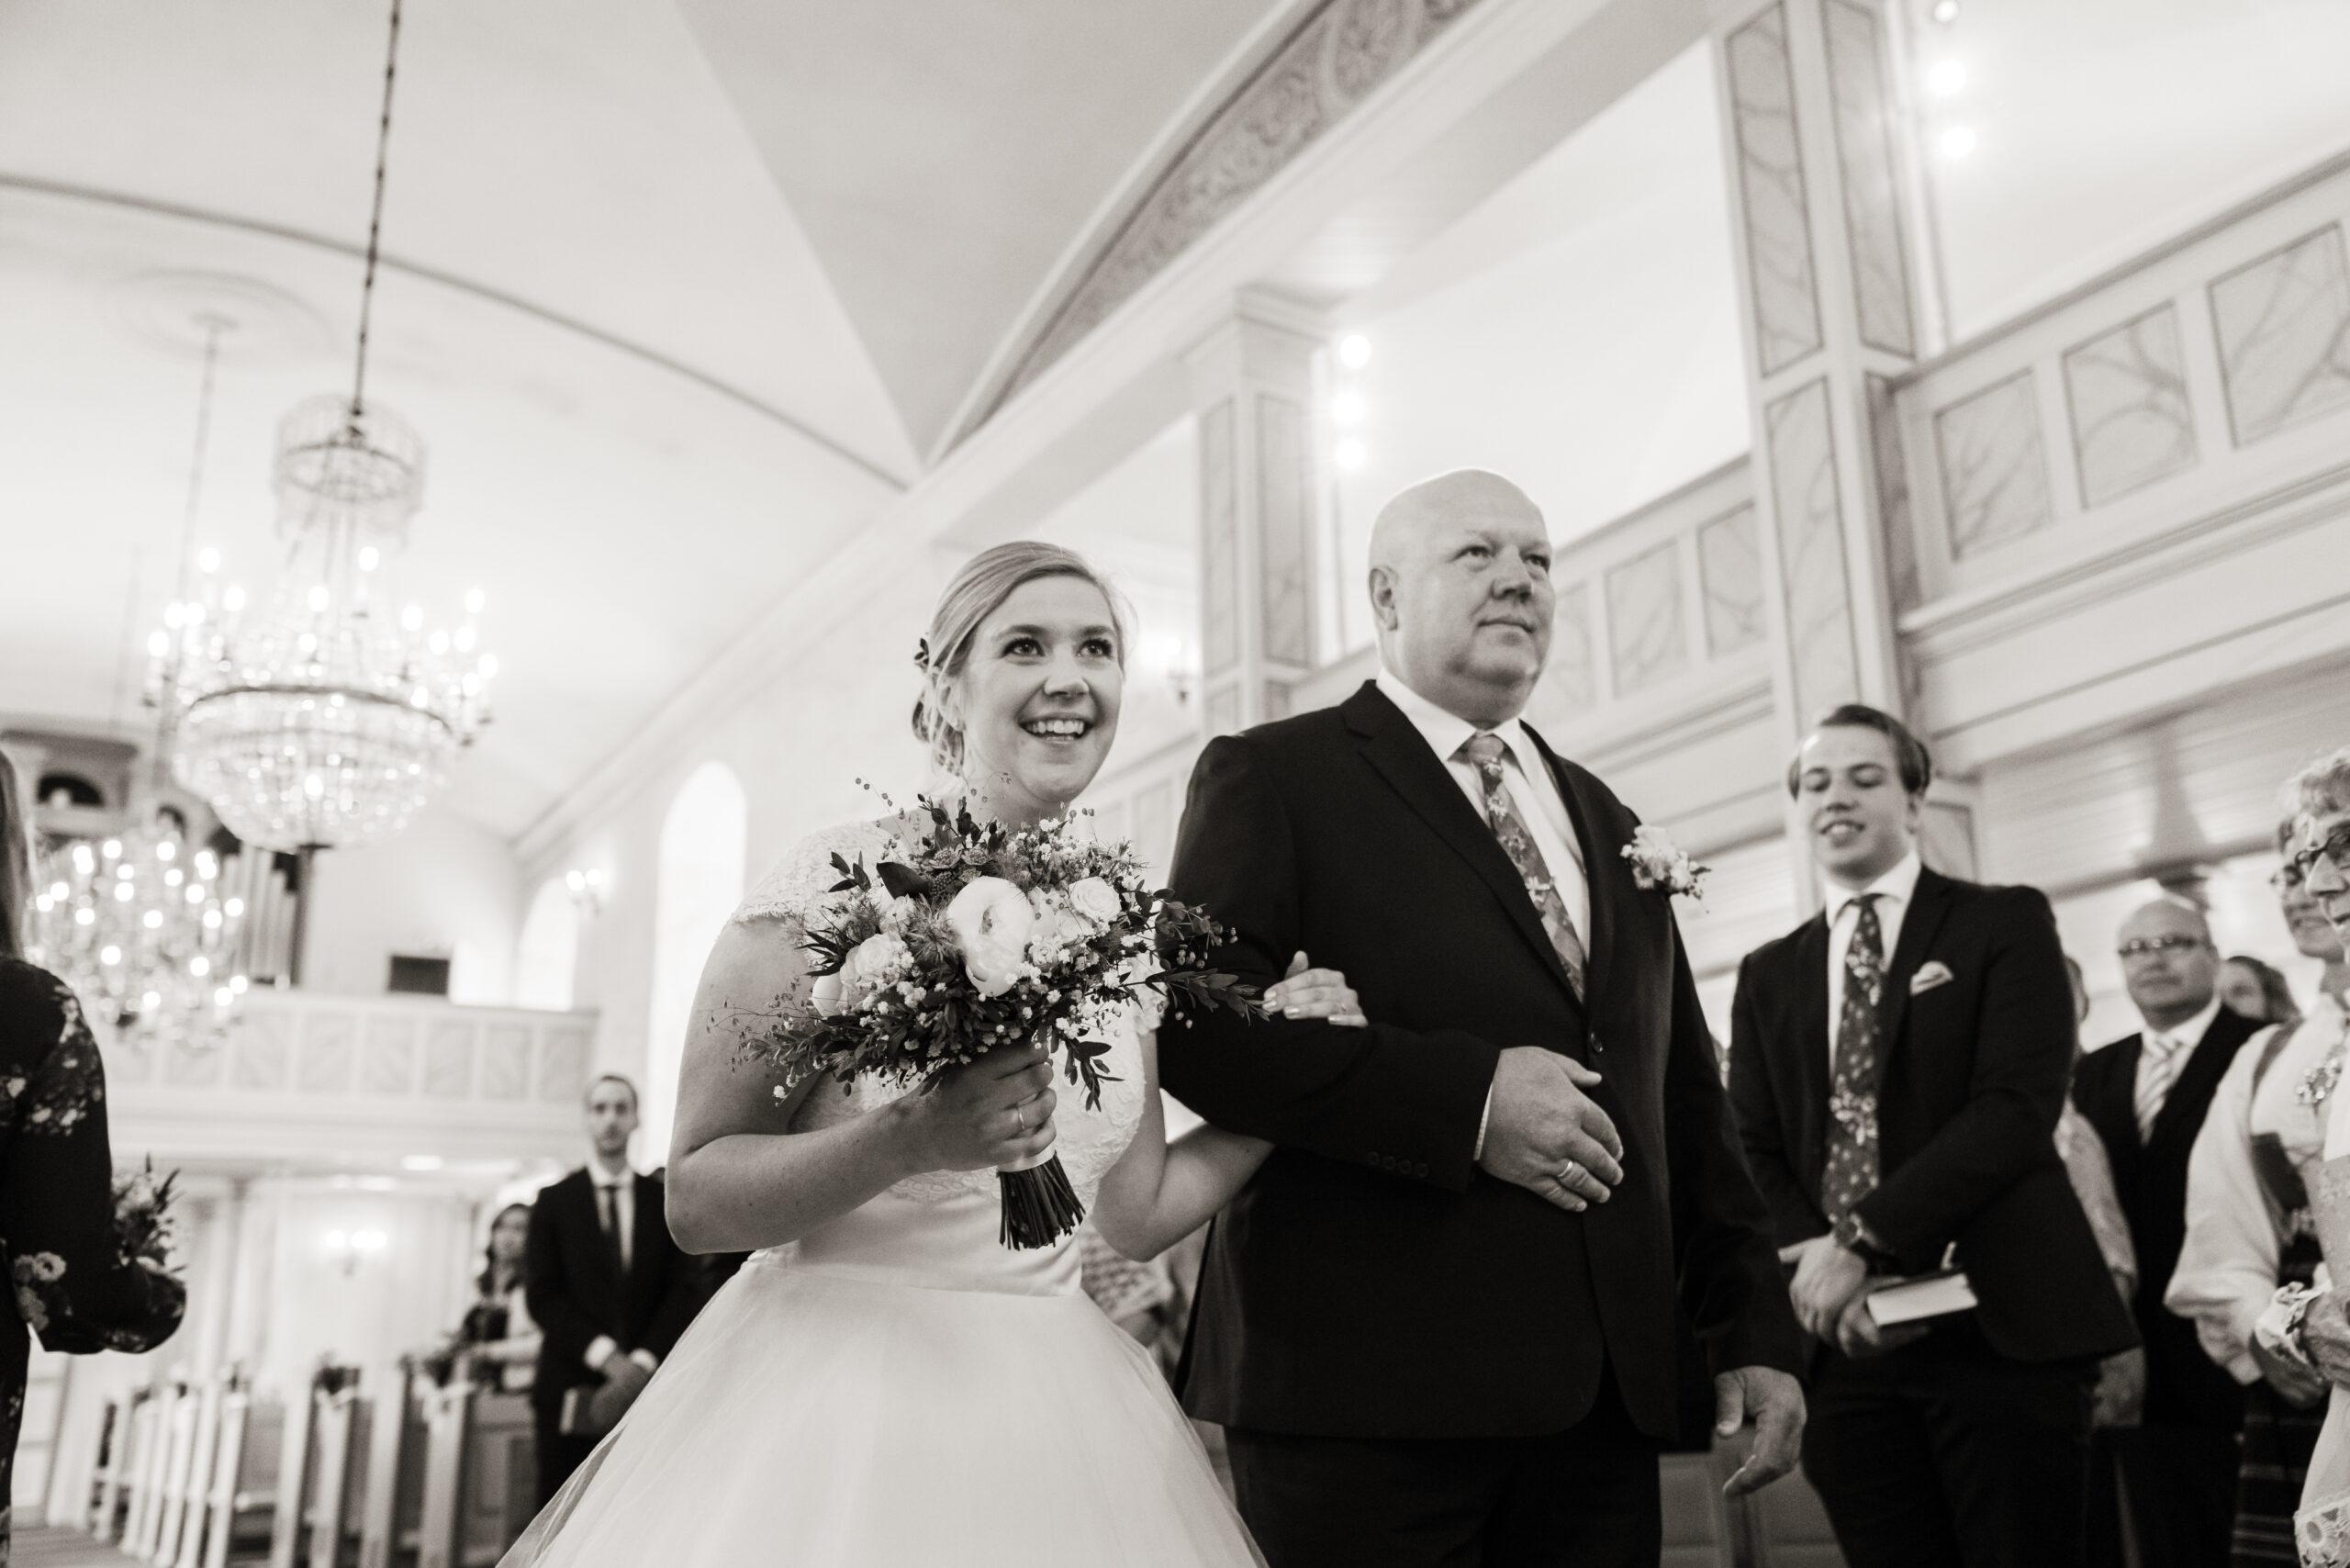 Bryllup i Nøtterø kirke